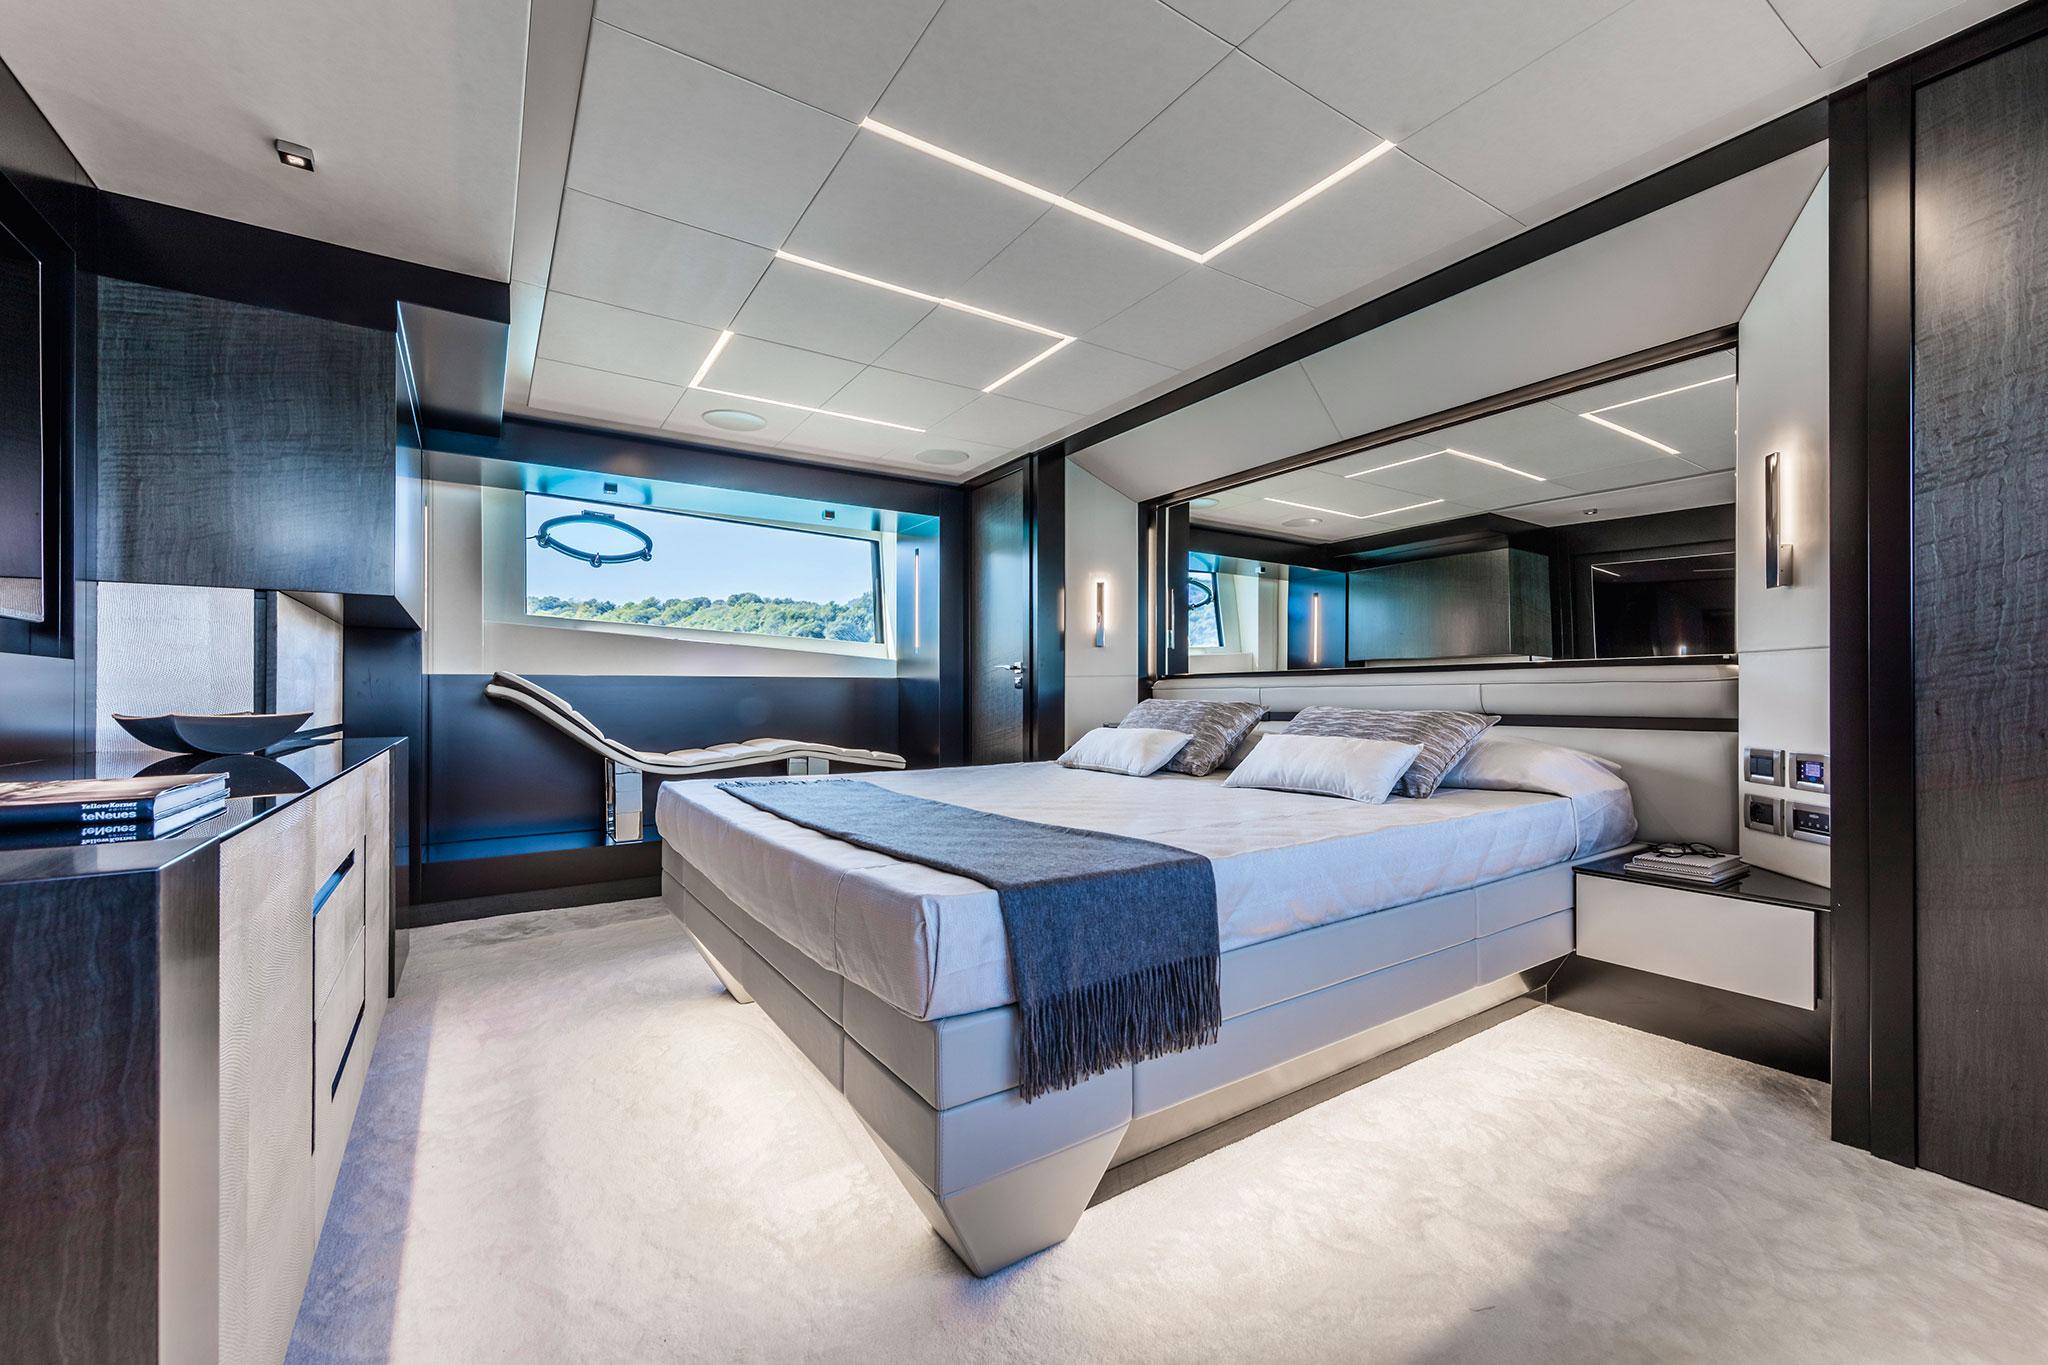 ferretti-group-pershing-9x-yachts-france-171-7